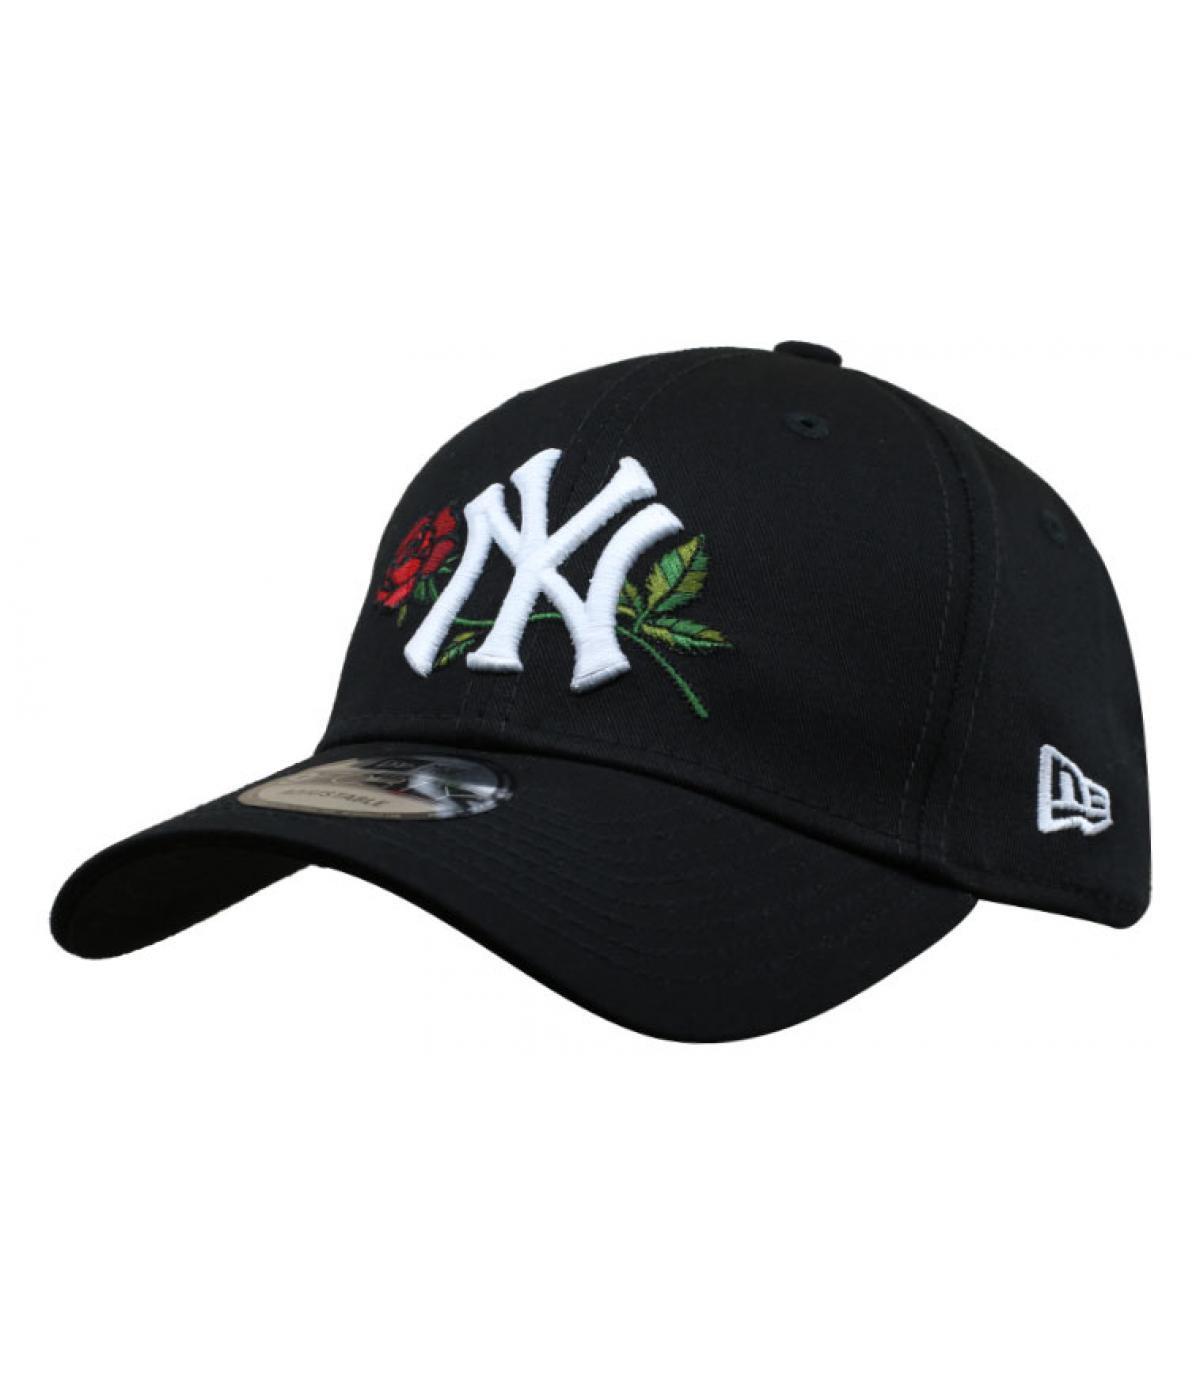 Details MLB Twine NY 940 black - afbeeling 2